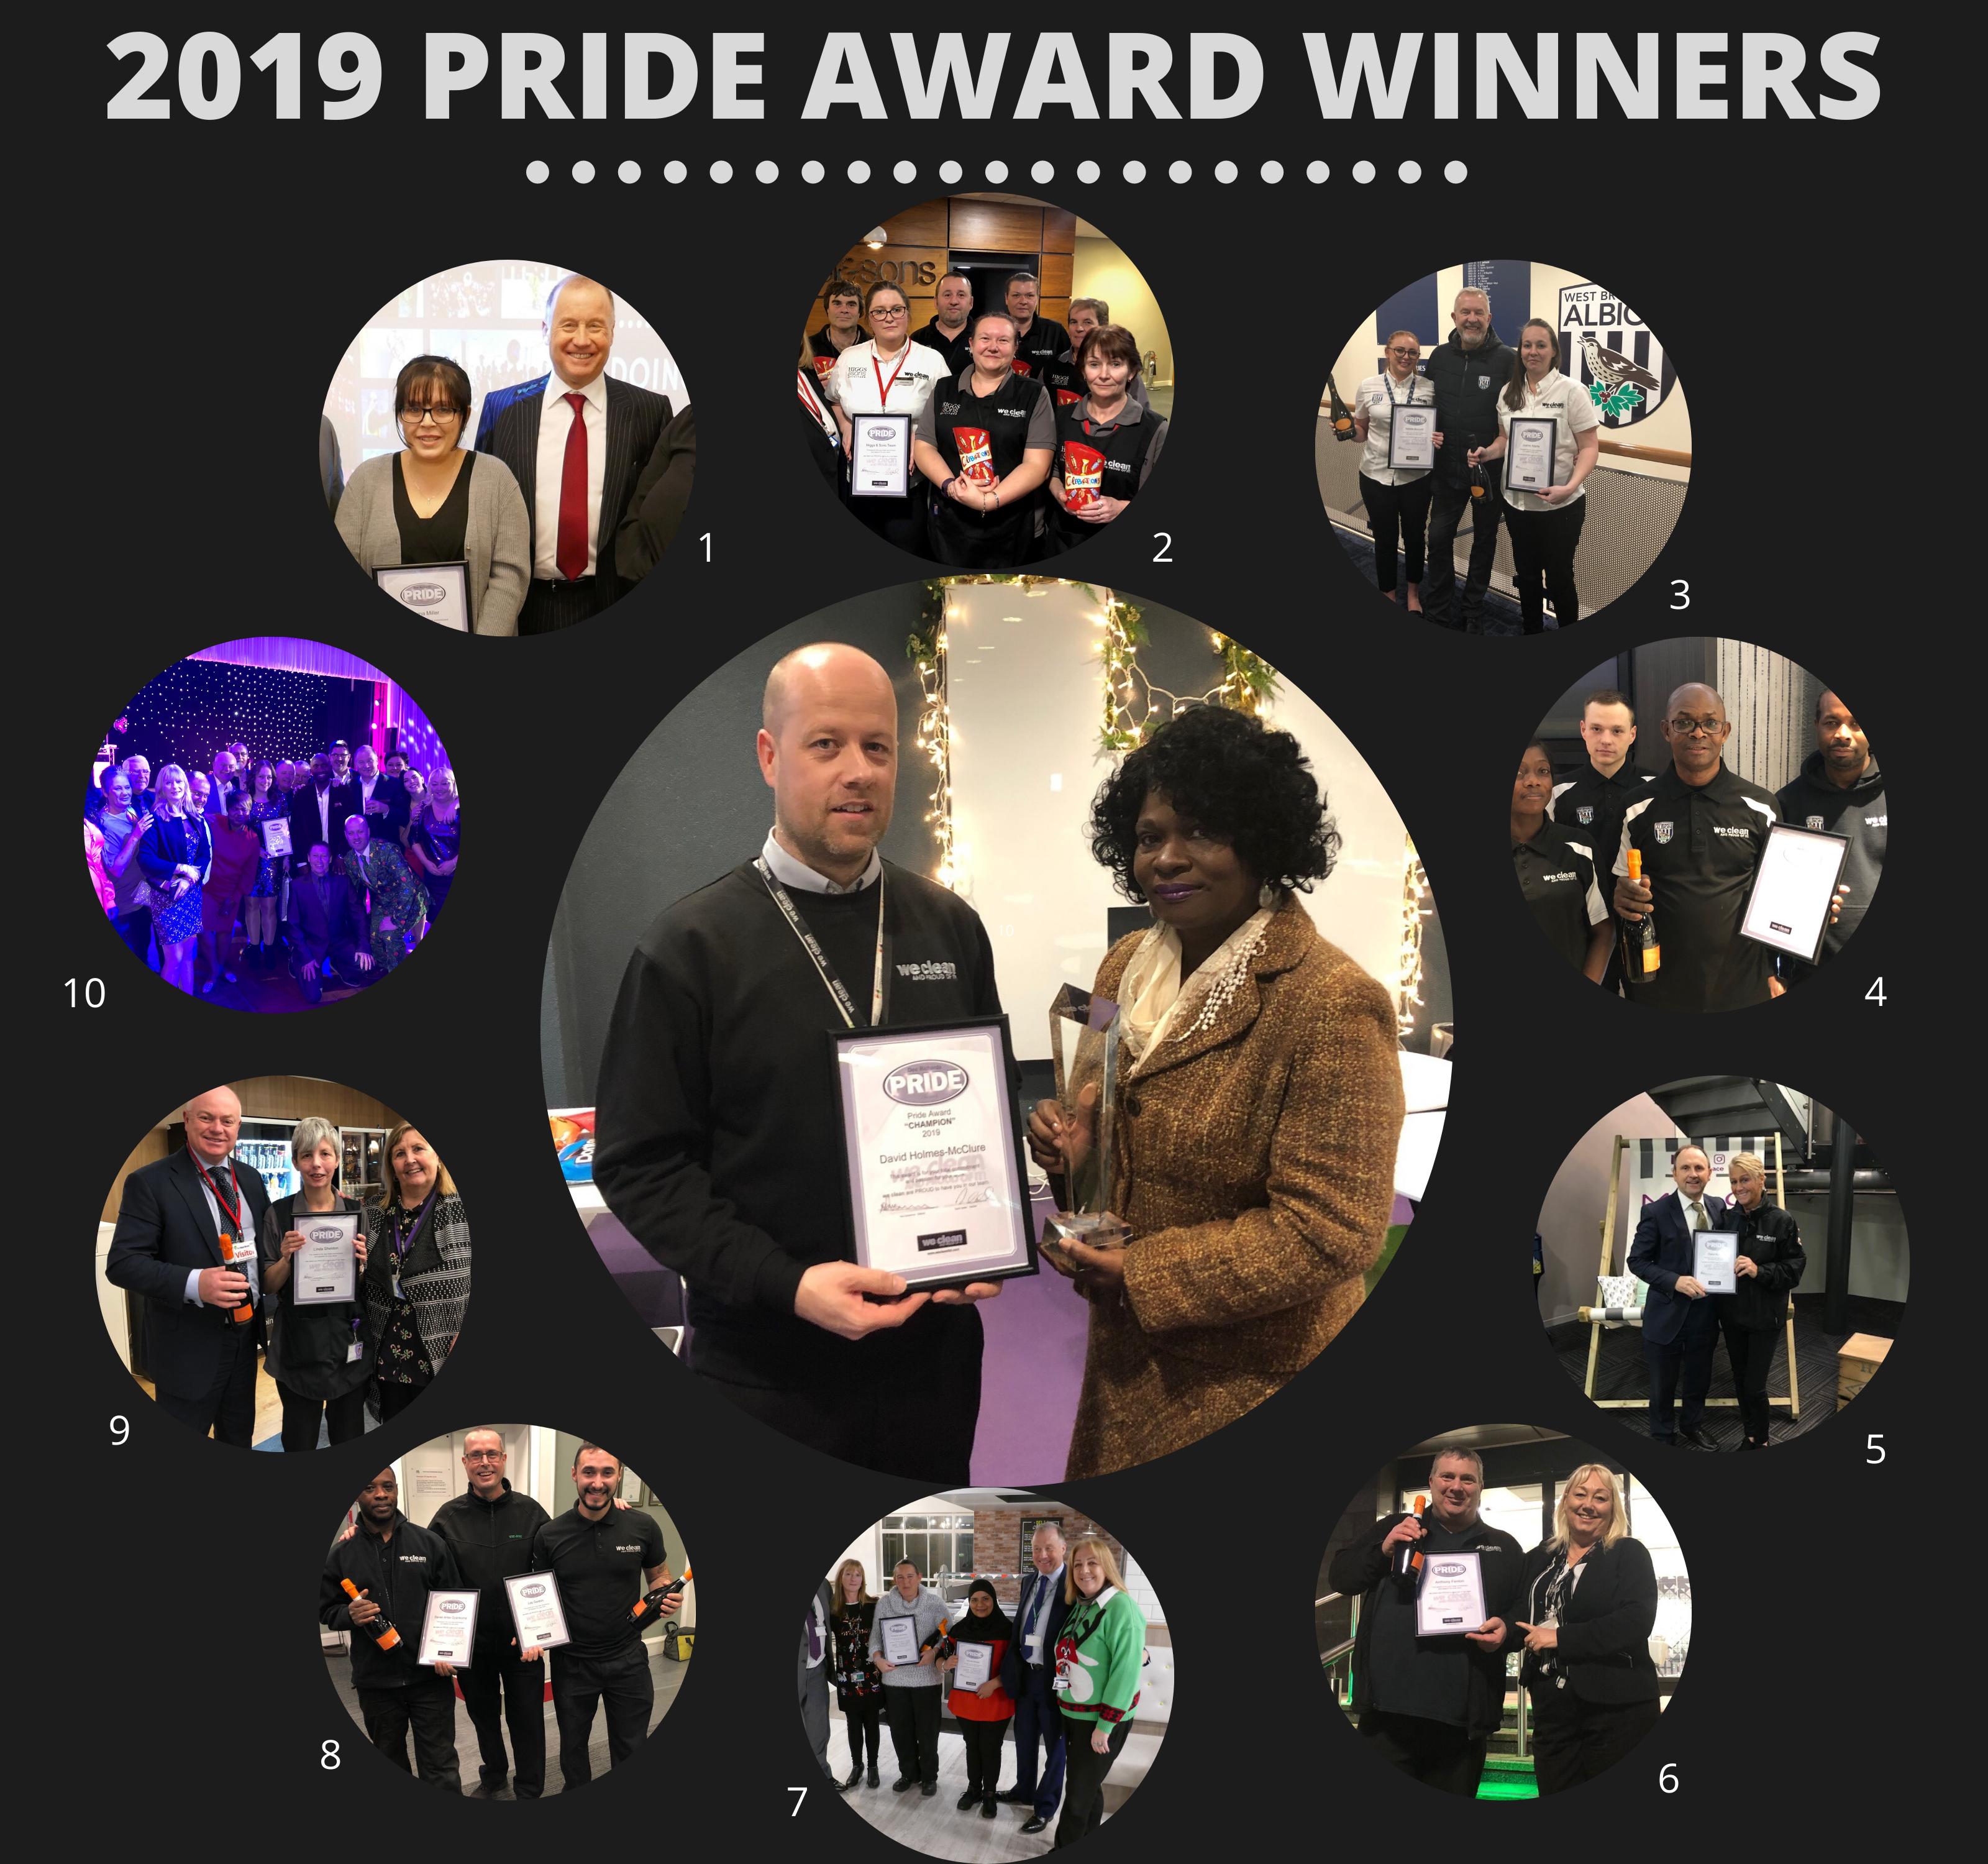 PRIDE-AWARD-WINNERS-2019-V2-1 2019 Pride Award Winners